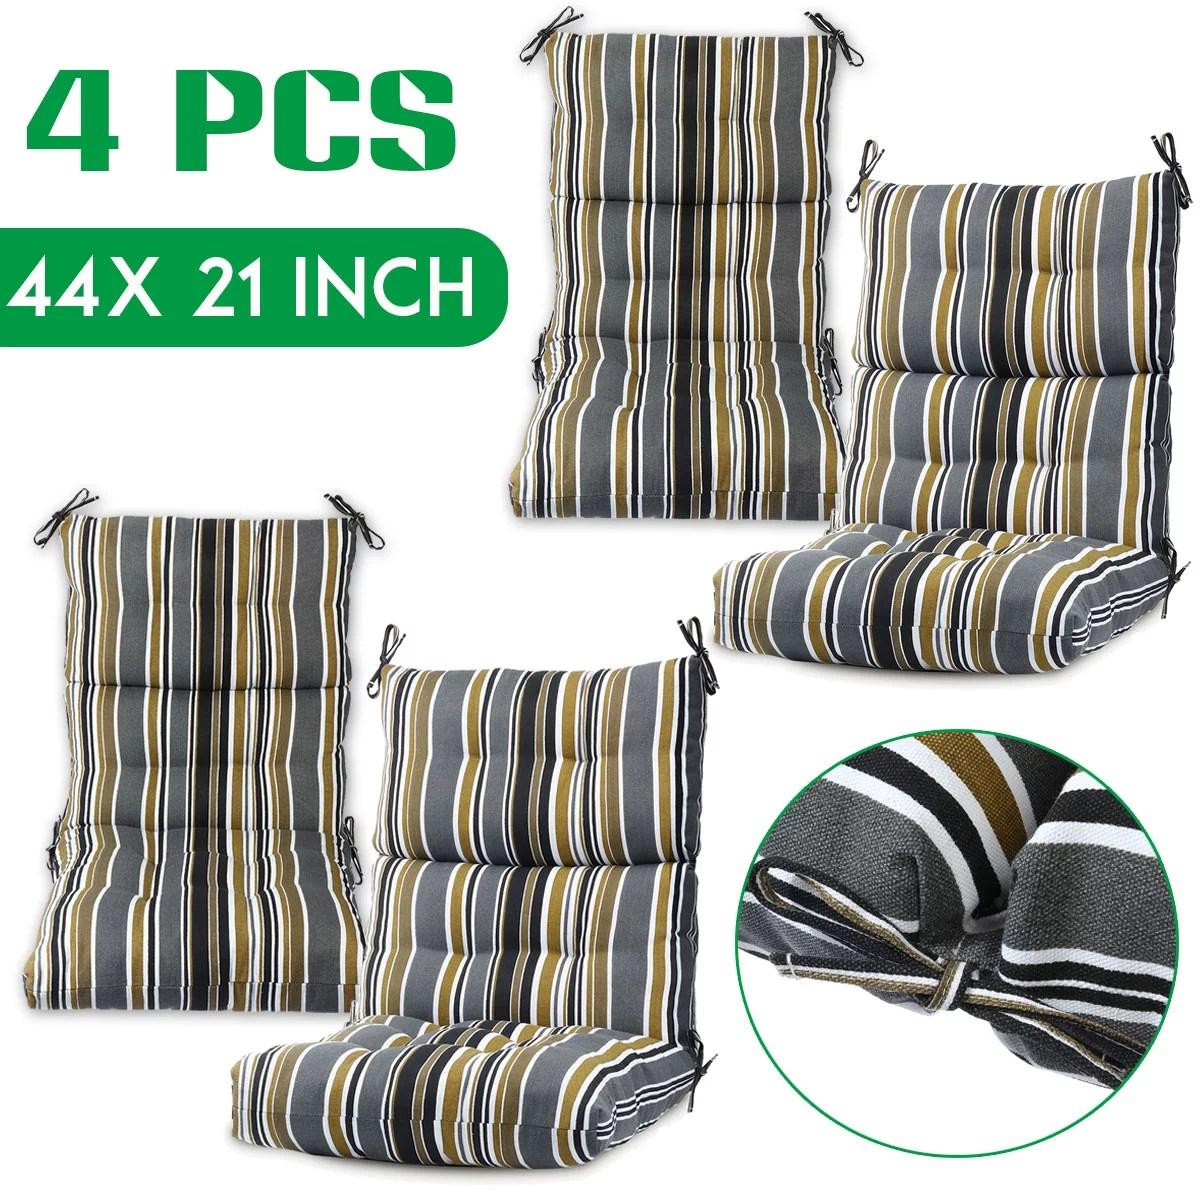 romhouse outdoor patio chair cushion set of 4 for garden decor multi color optional